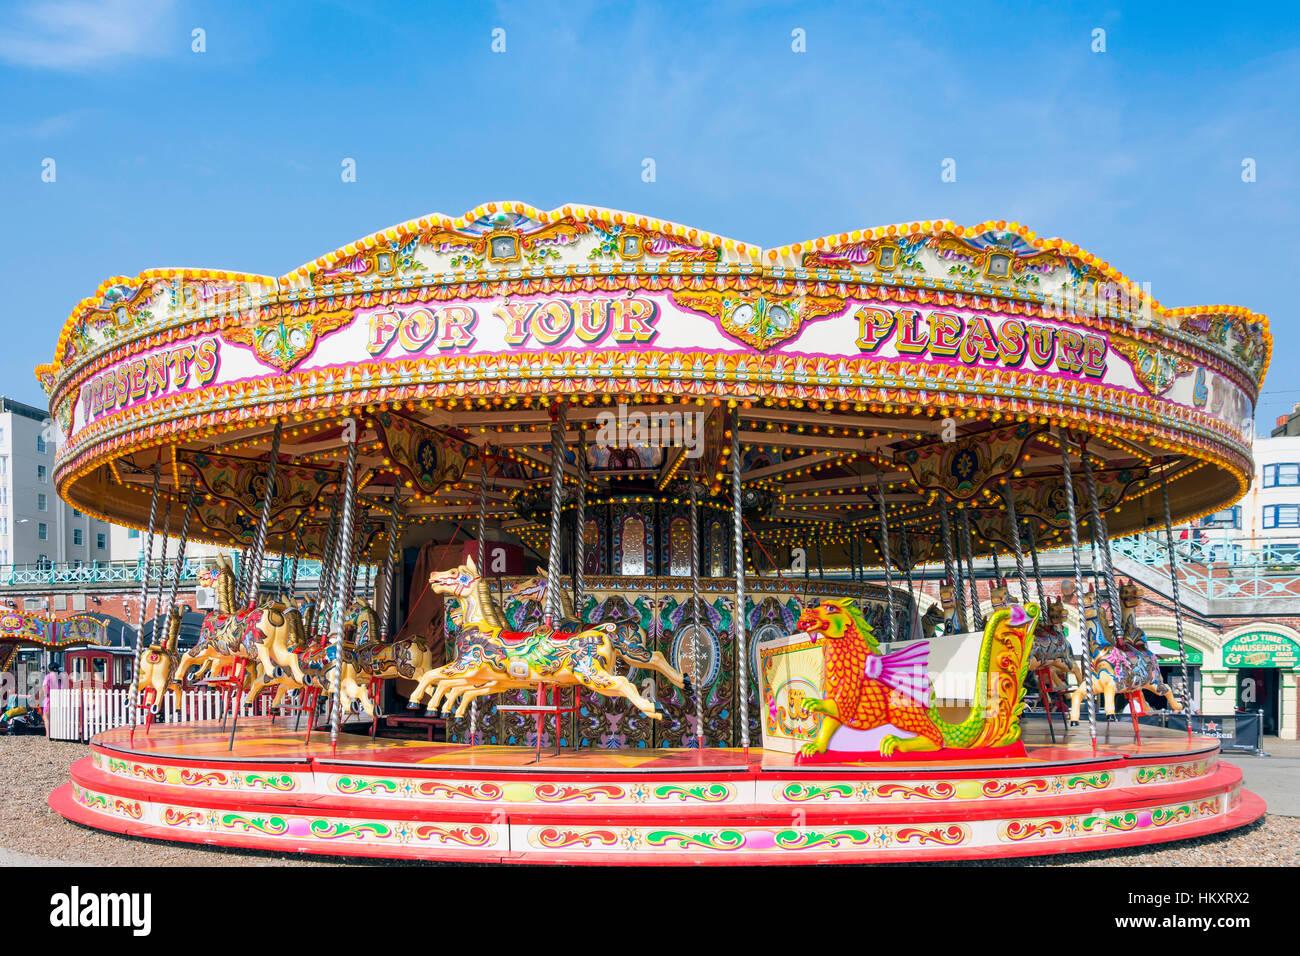 Kinderkarussell an Strandpromenade, Brighton, East Sussex, England, Vereinigtes Königreich Stockfoto